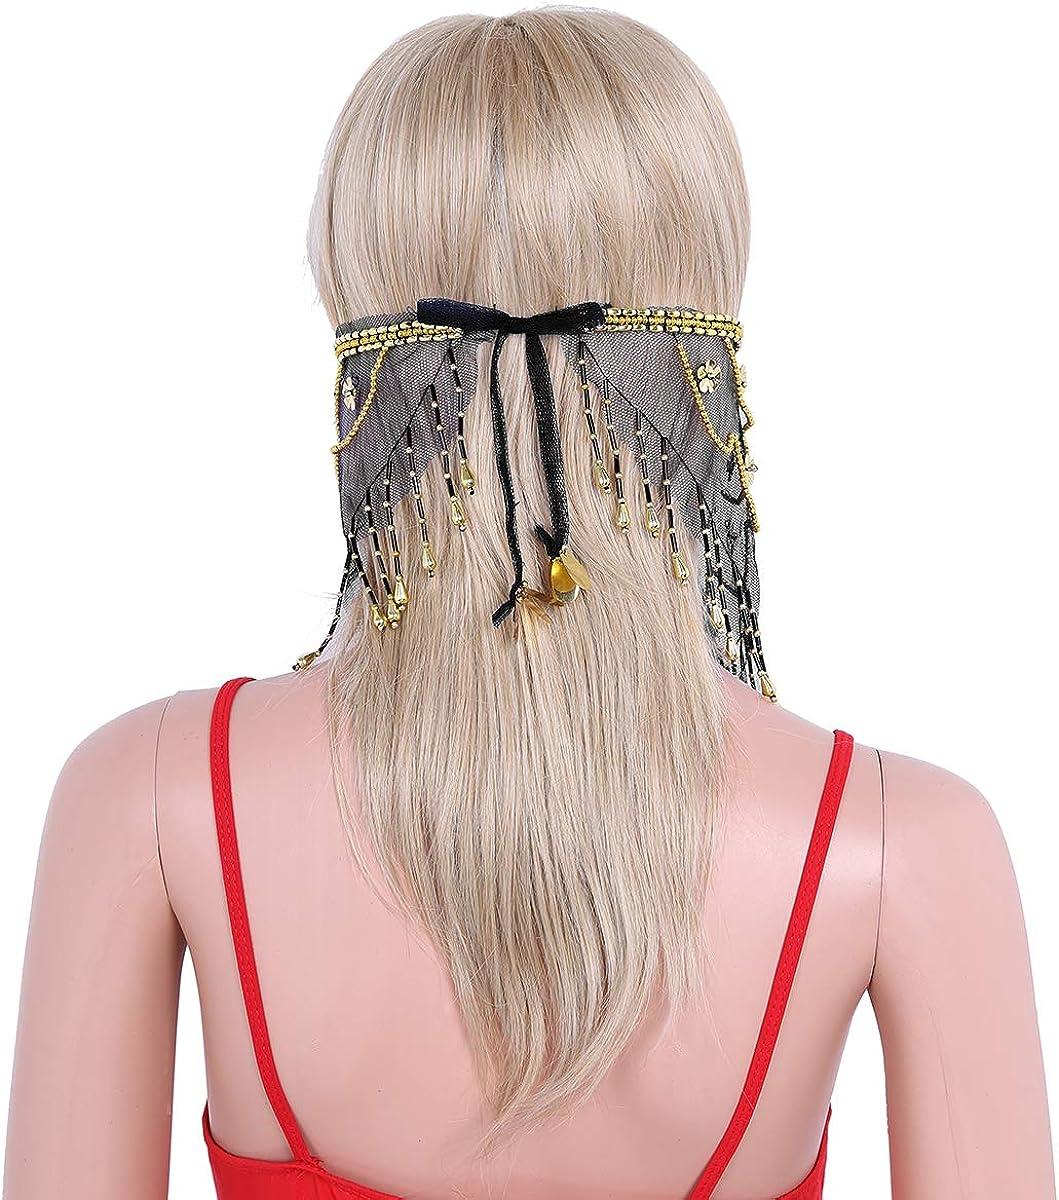 Women/'s Veil Headwear Beads Tassels Belly Dance Face Veil Costume Accessory